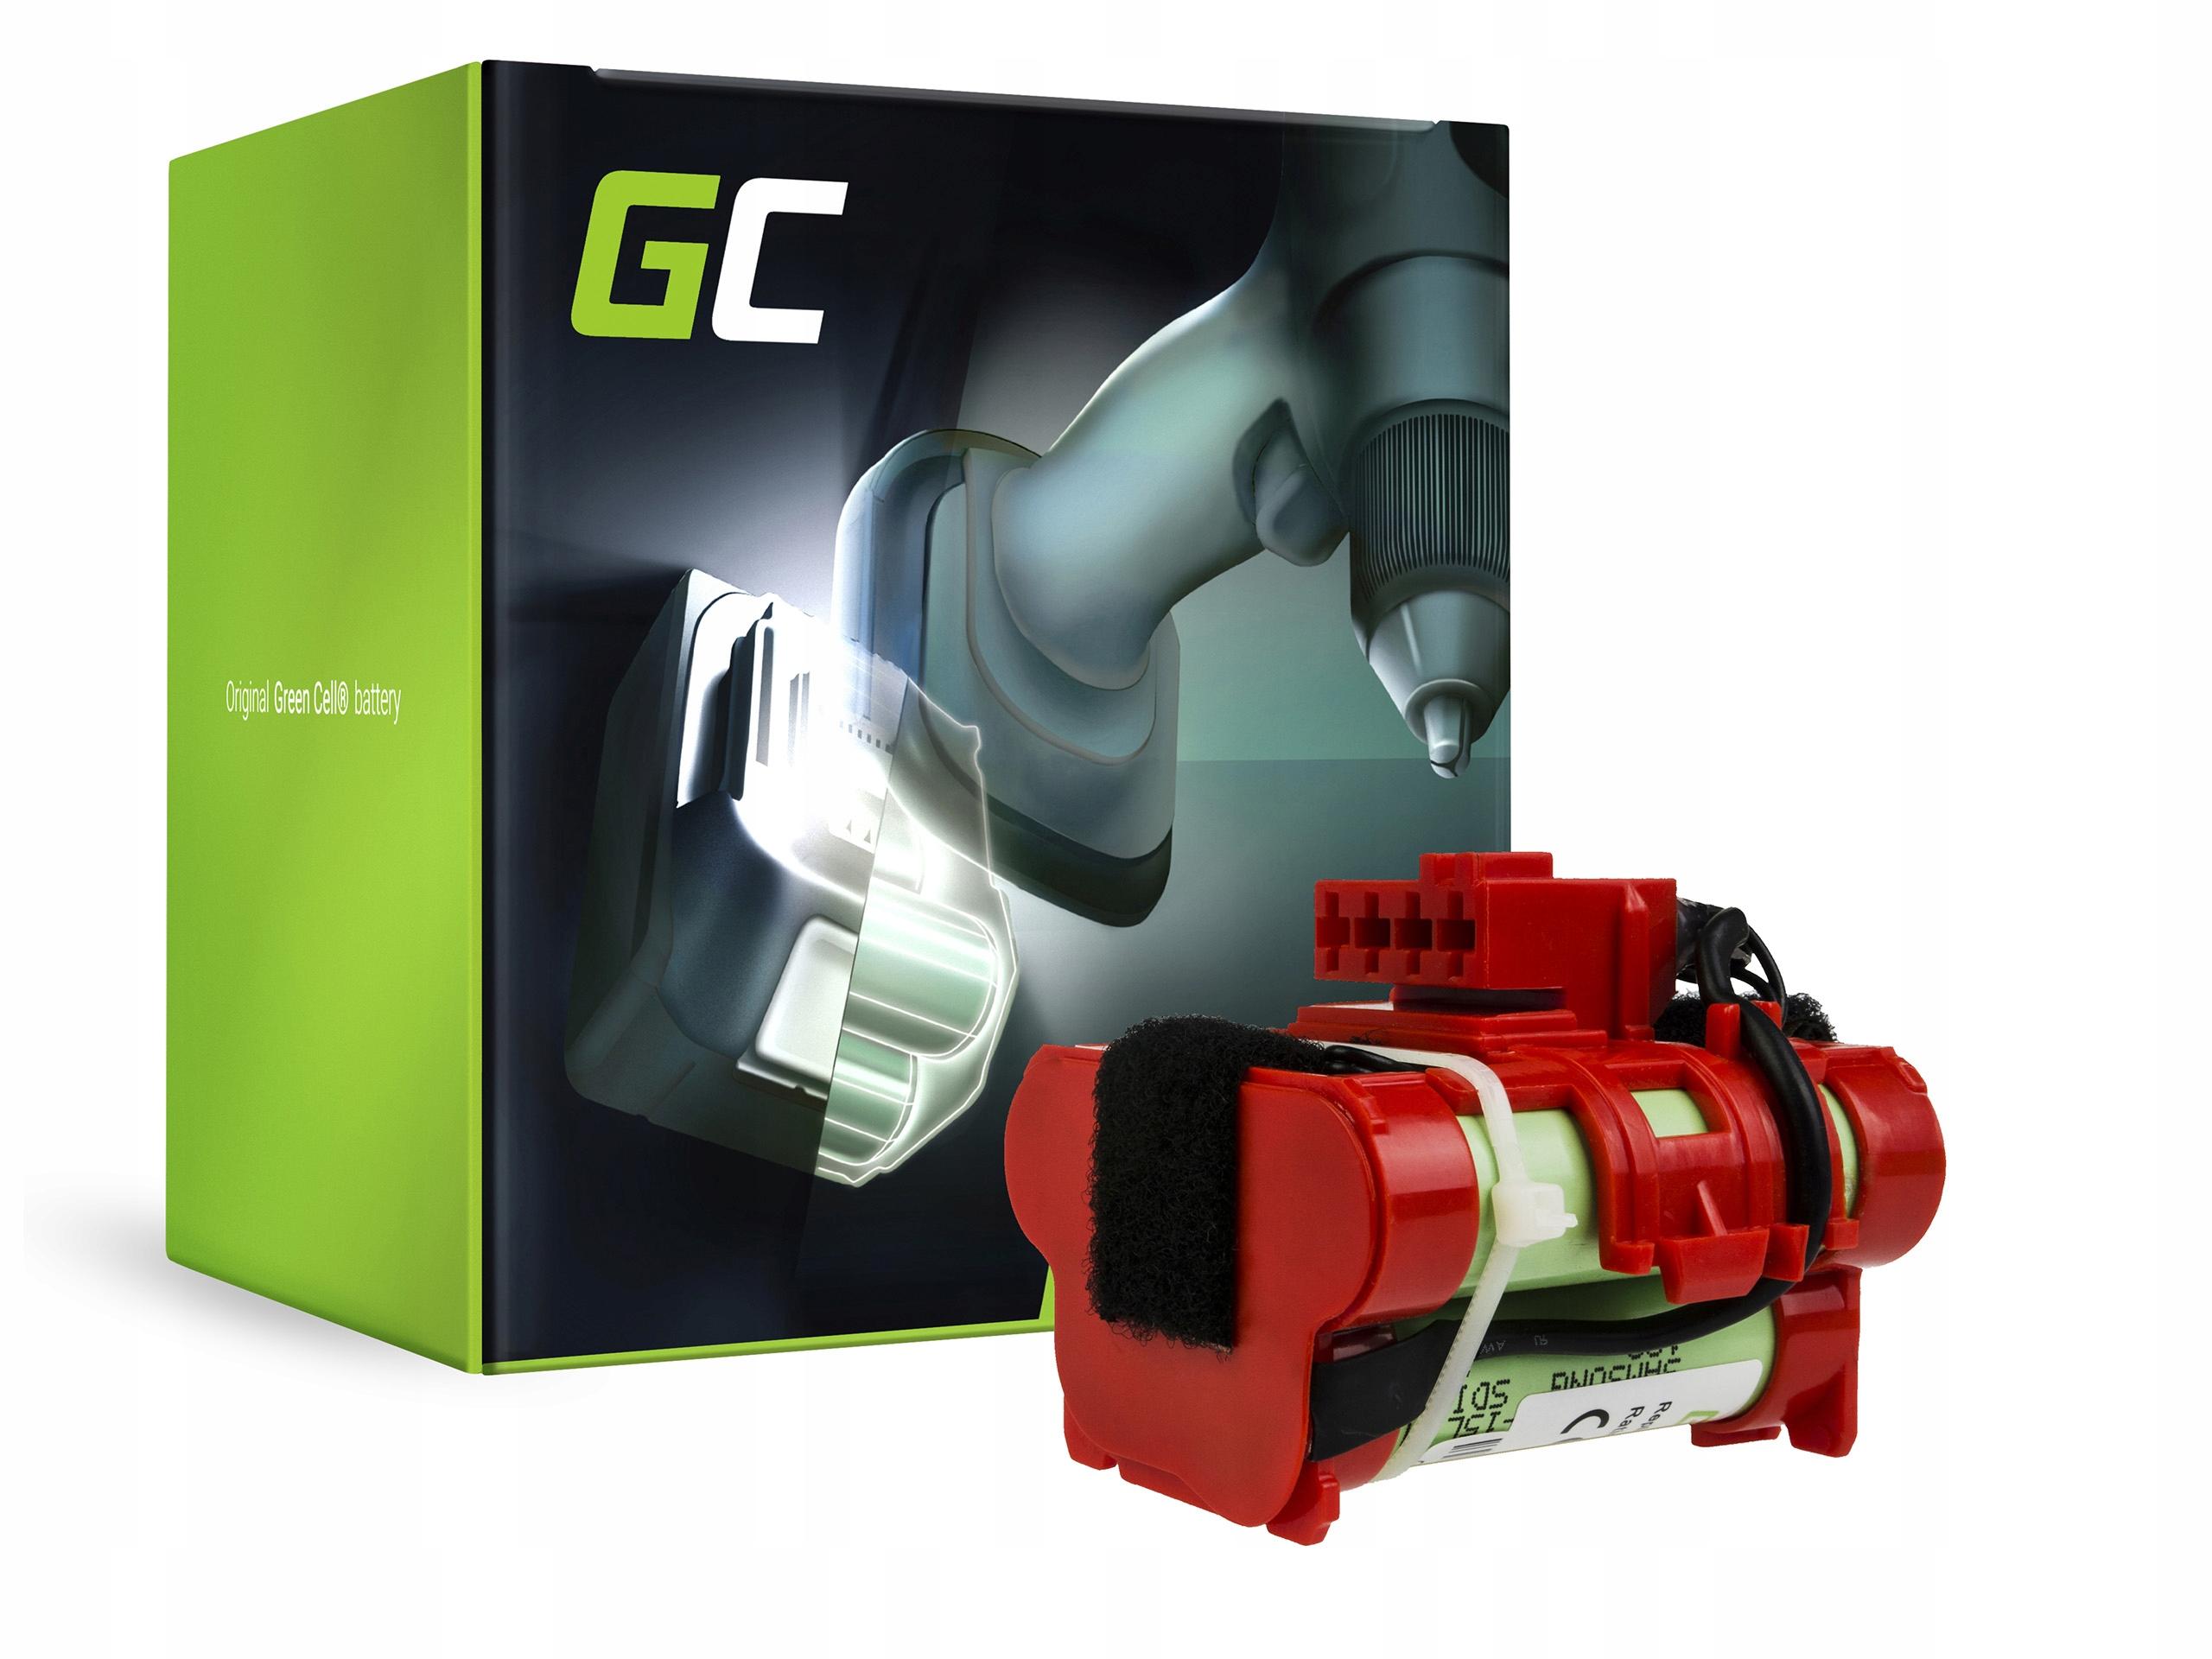 Batérie 18V 1.5 Ah batérie pre Gardena R70